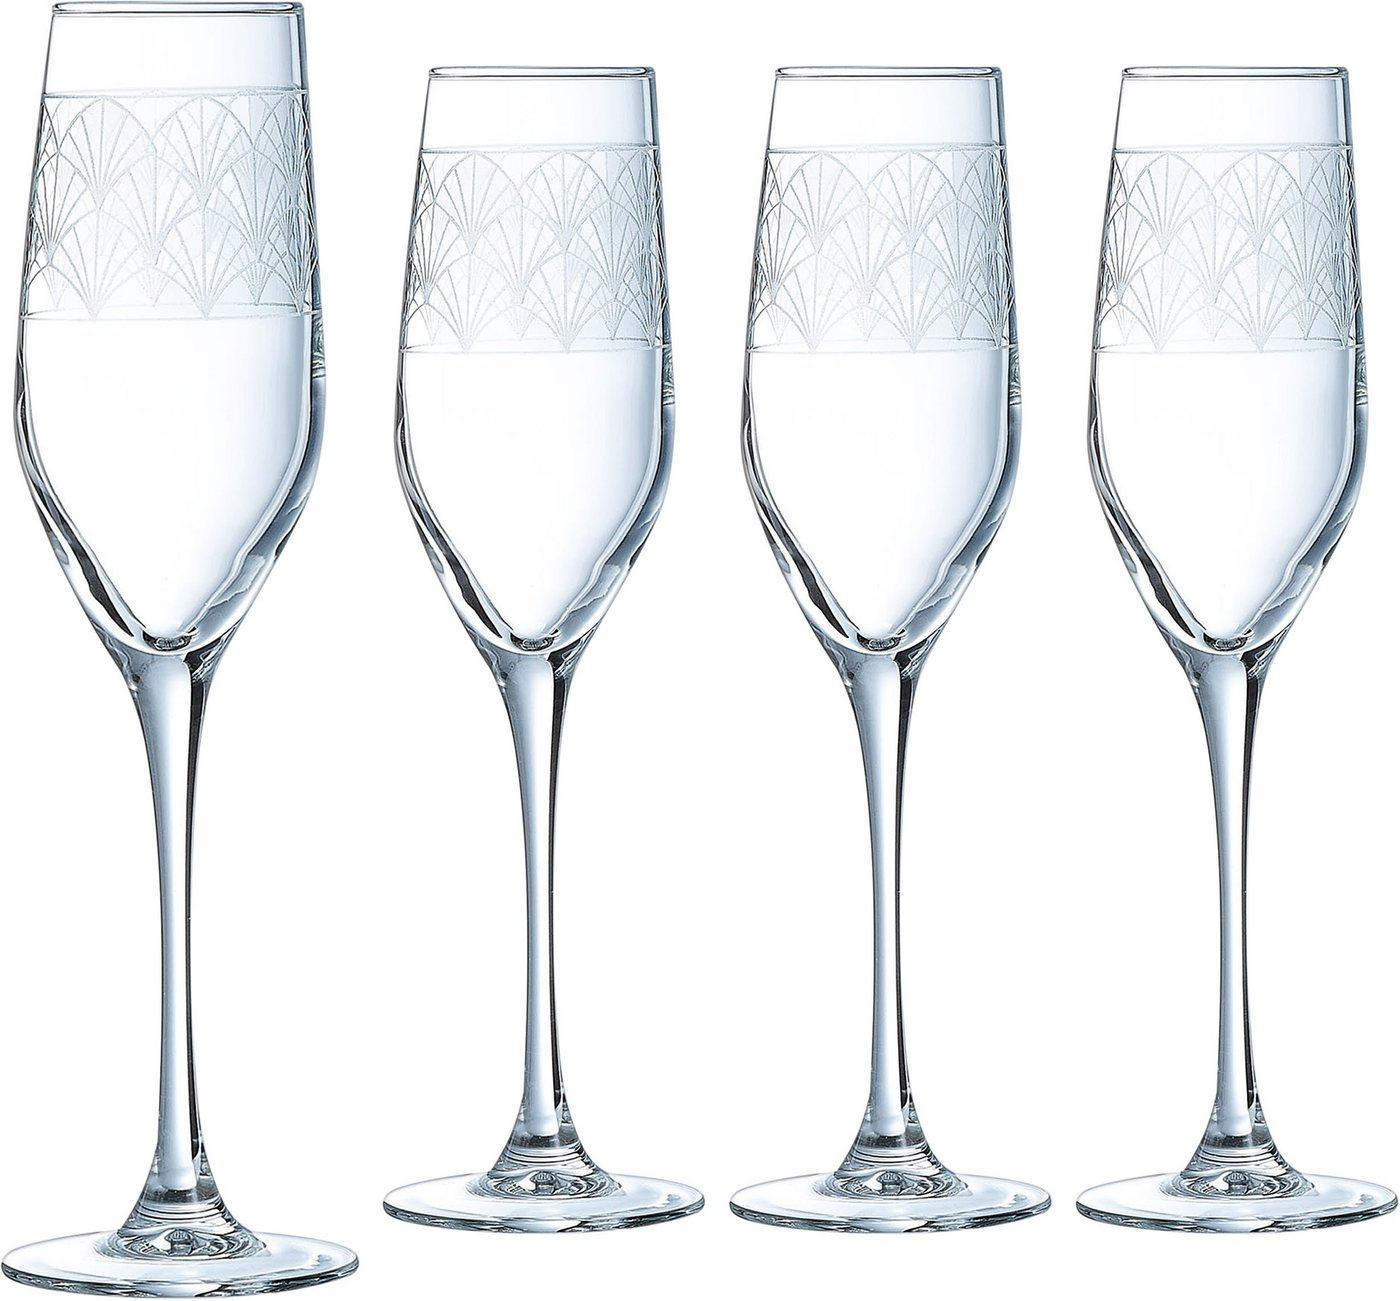 Luminarc Sektglas »Paradisio«, Glas, in Pantographie-Optik, 4-teilig